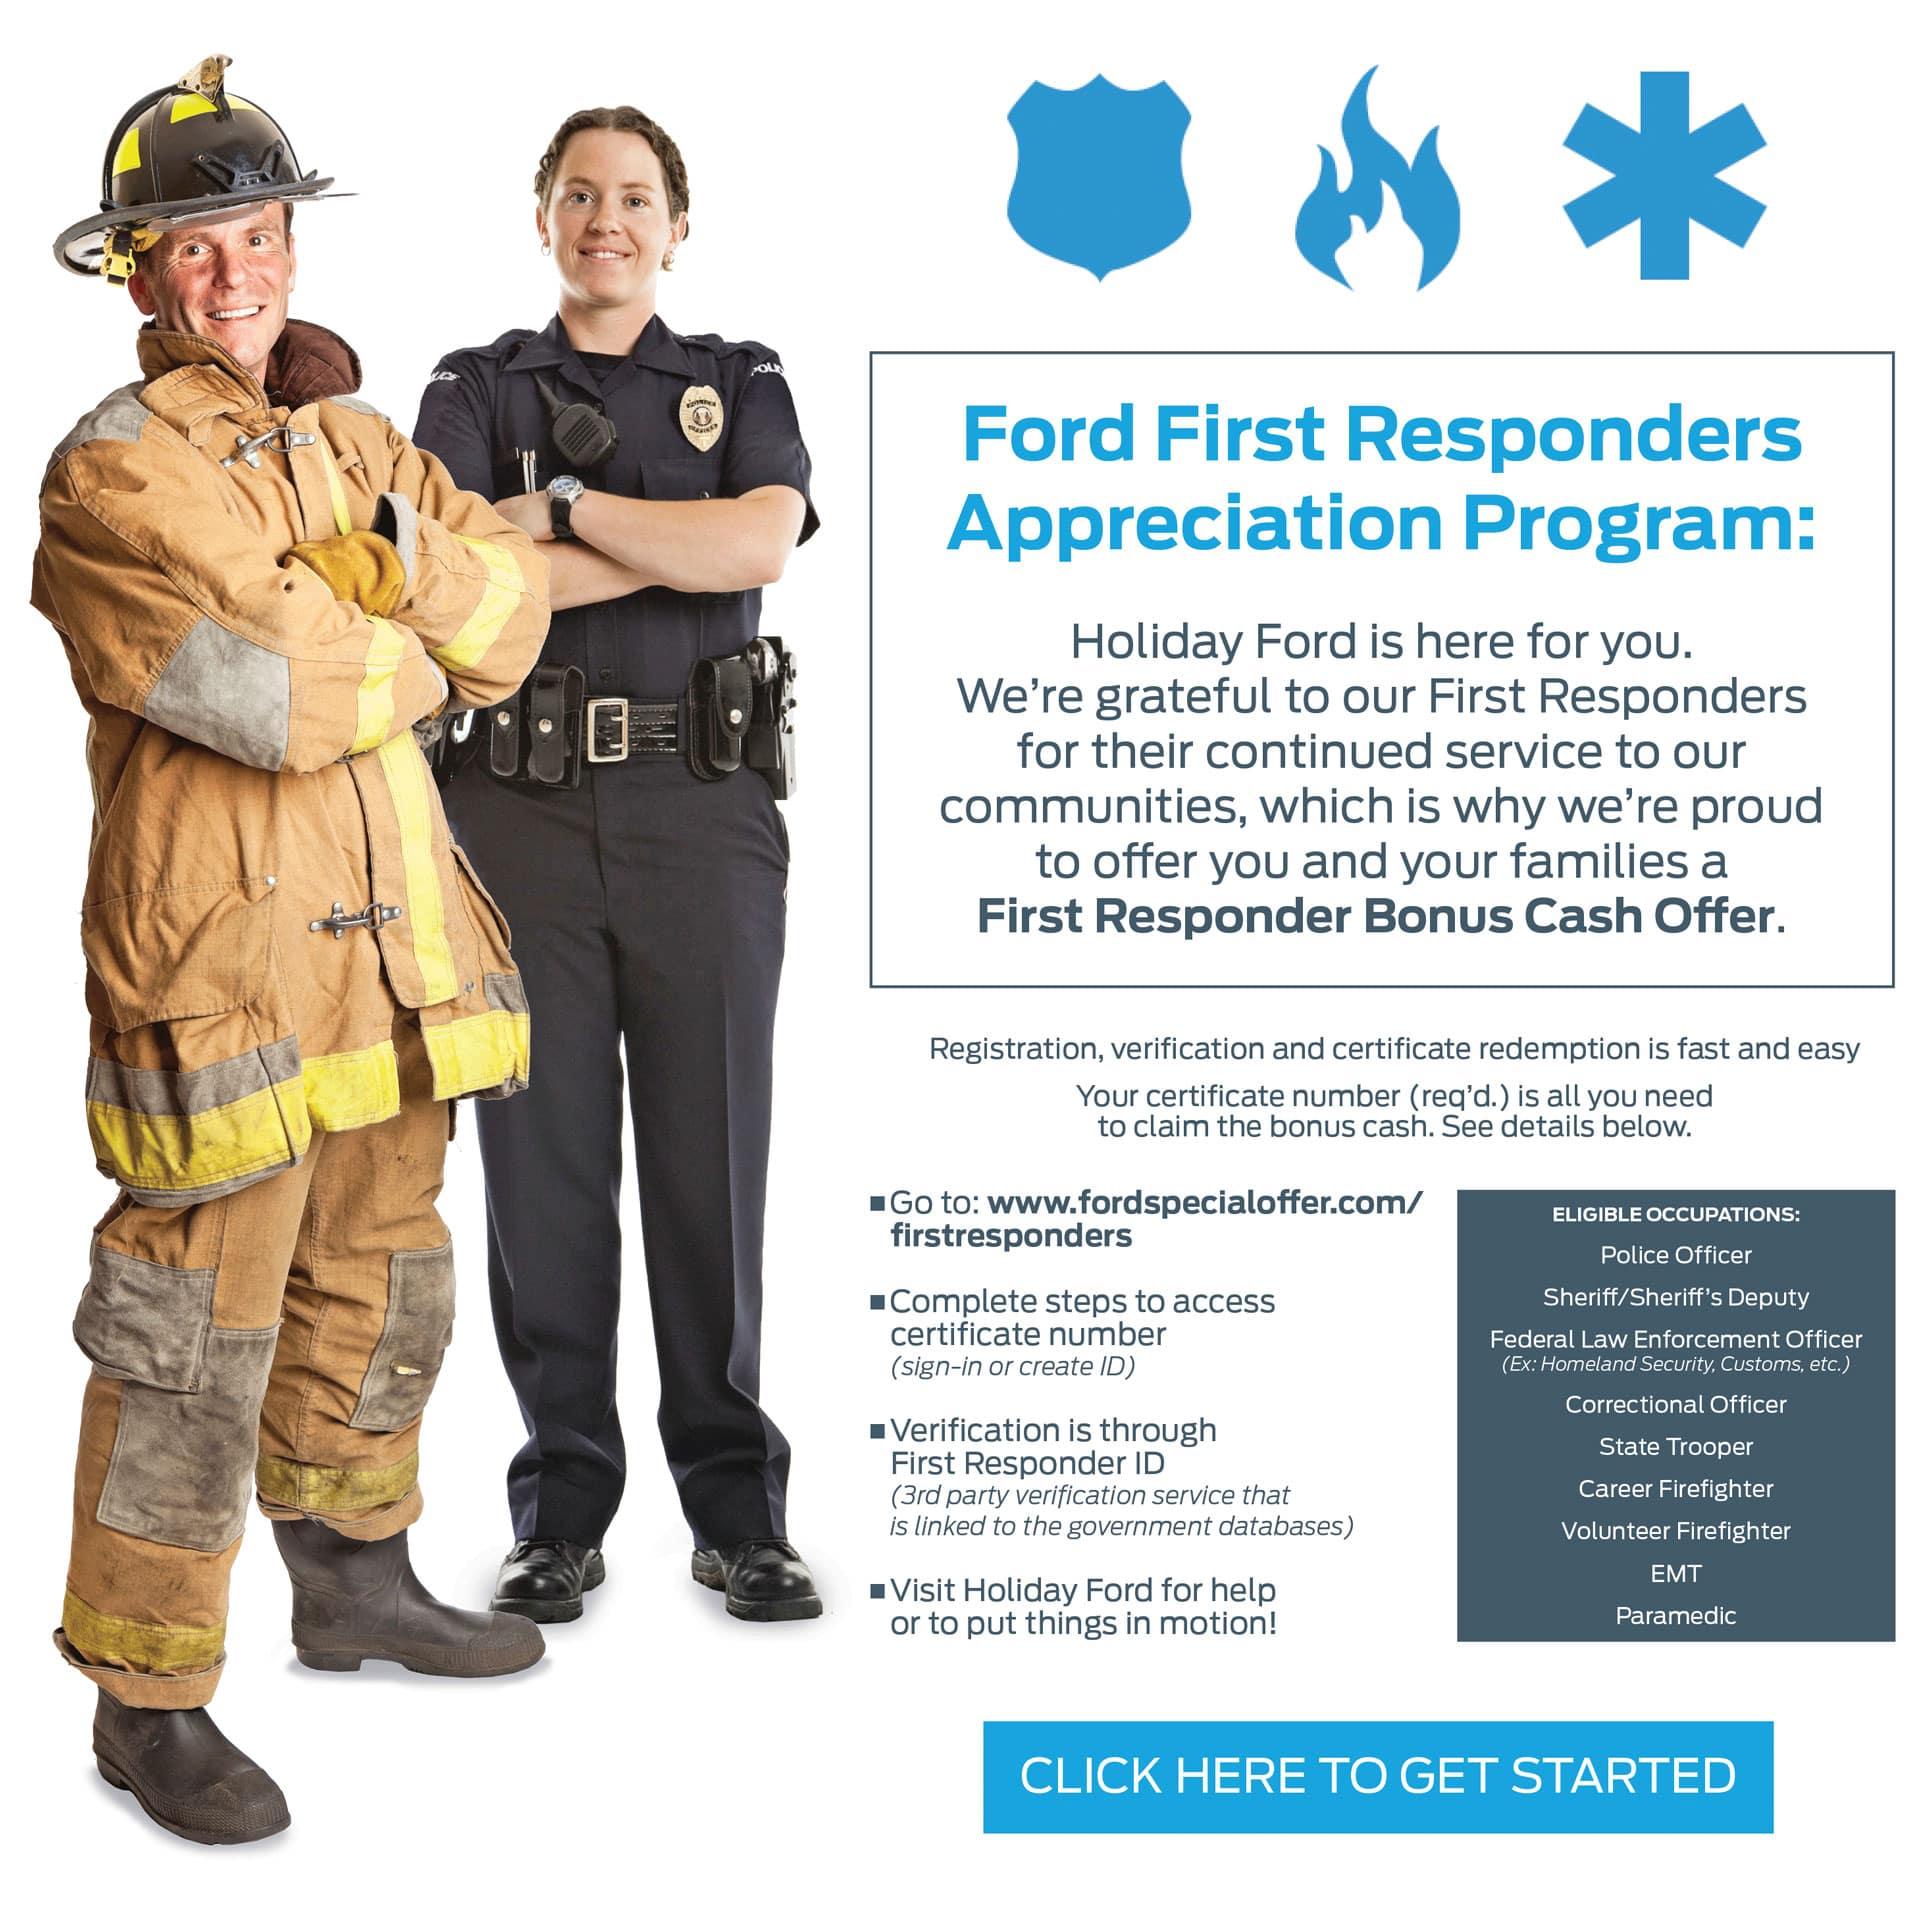 Ford First Responder Appreciation Program